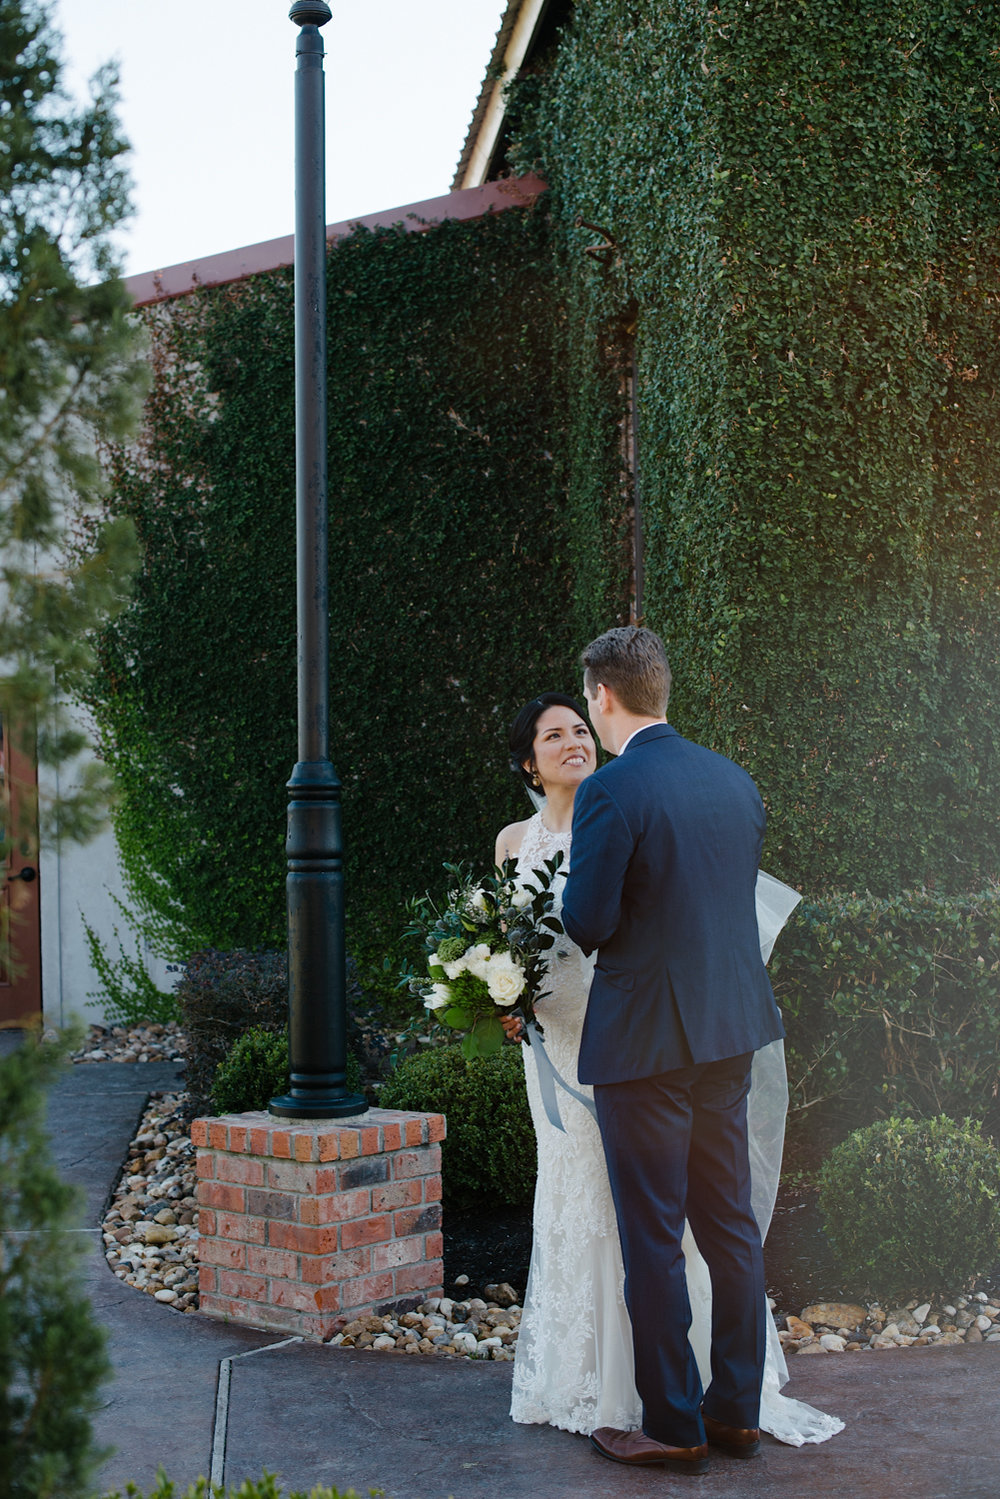 casperwedding-texasweddings-houstonweddings-oldedobbestation-montgomerytx-montgomeryweddings-bride-groom-bridalparty-weddingdress-51.jpg